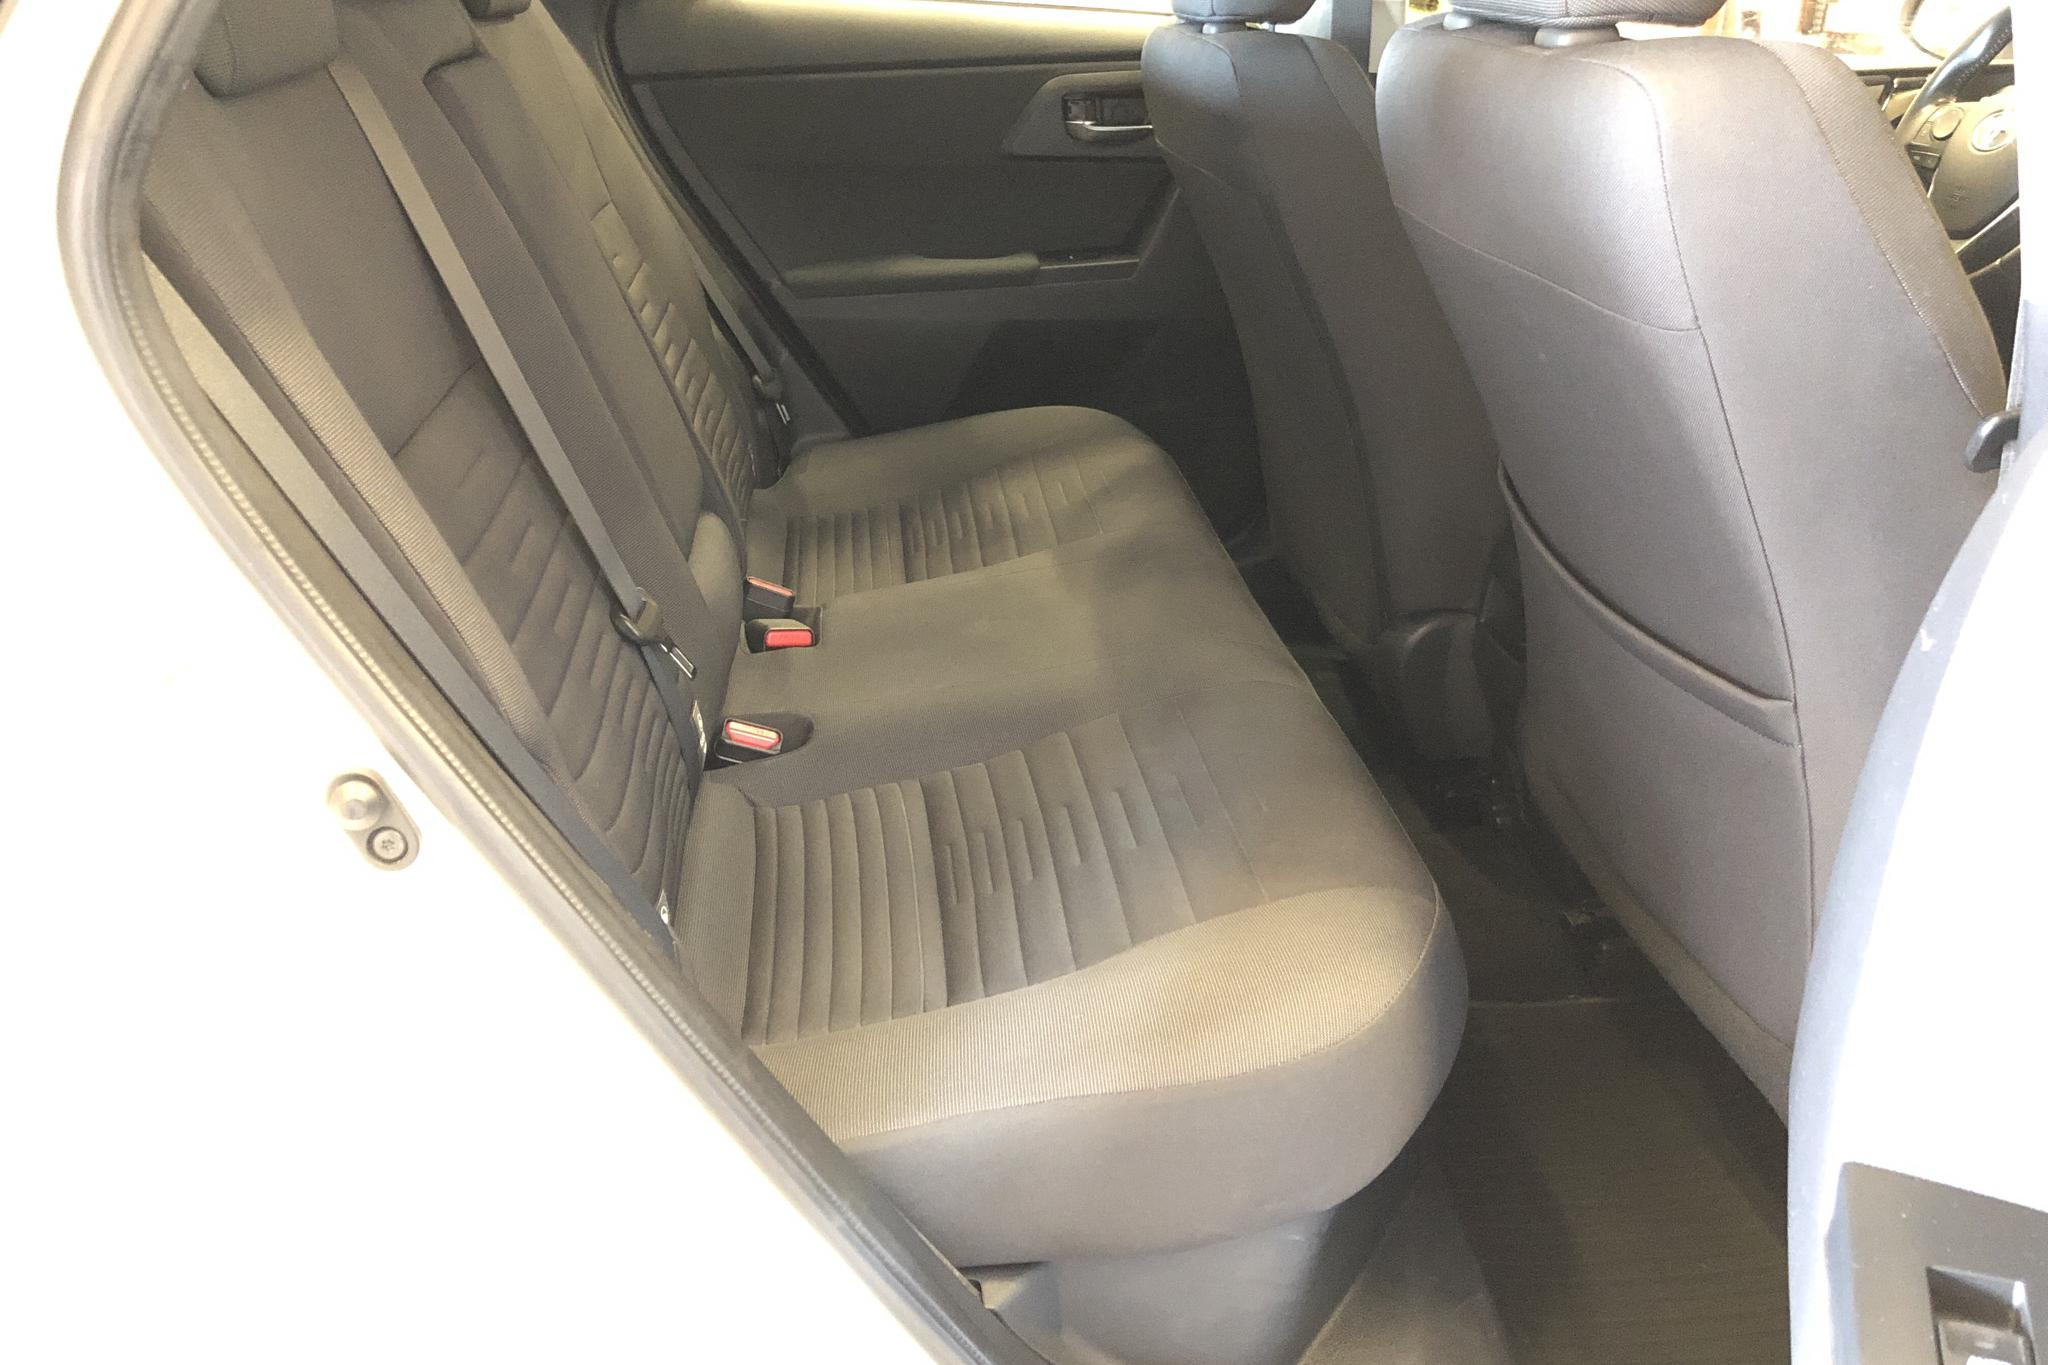 Toyota Auris 1.8 HSD 5dr (99hk) - 97 330 km - Automatic - white - 2016